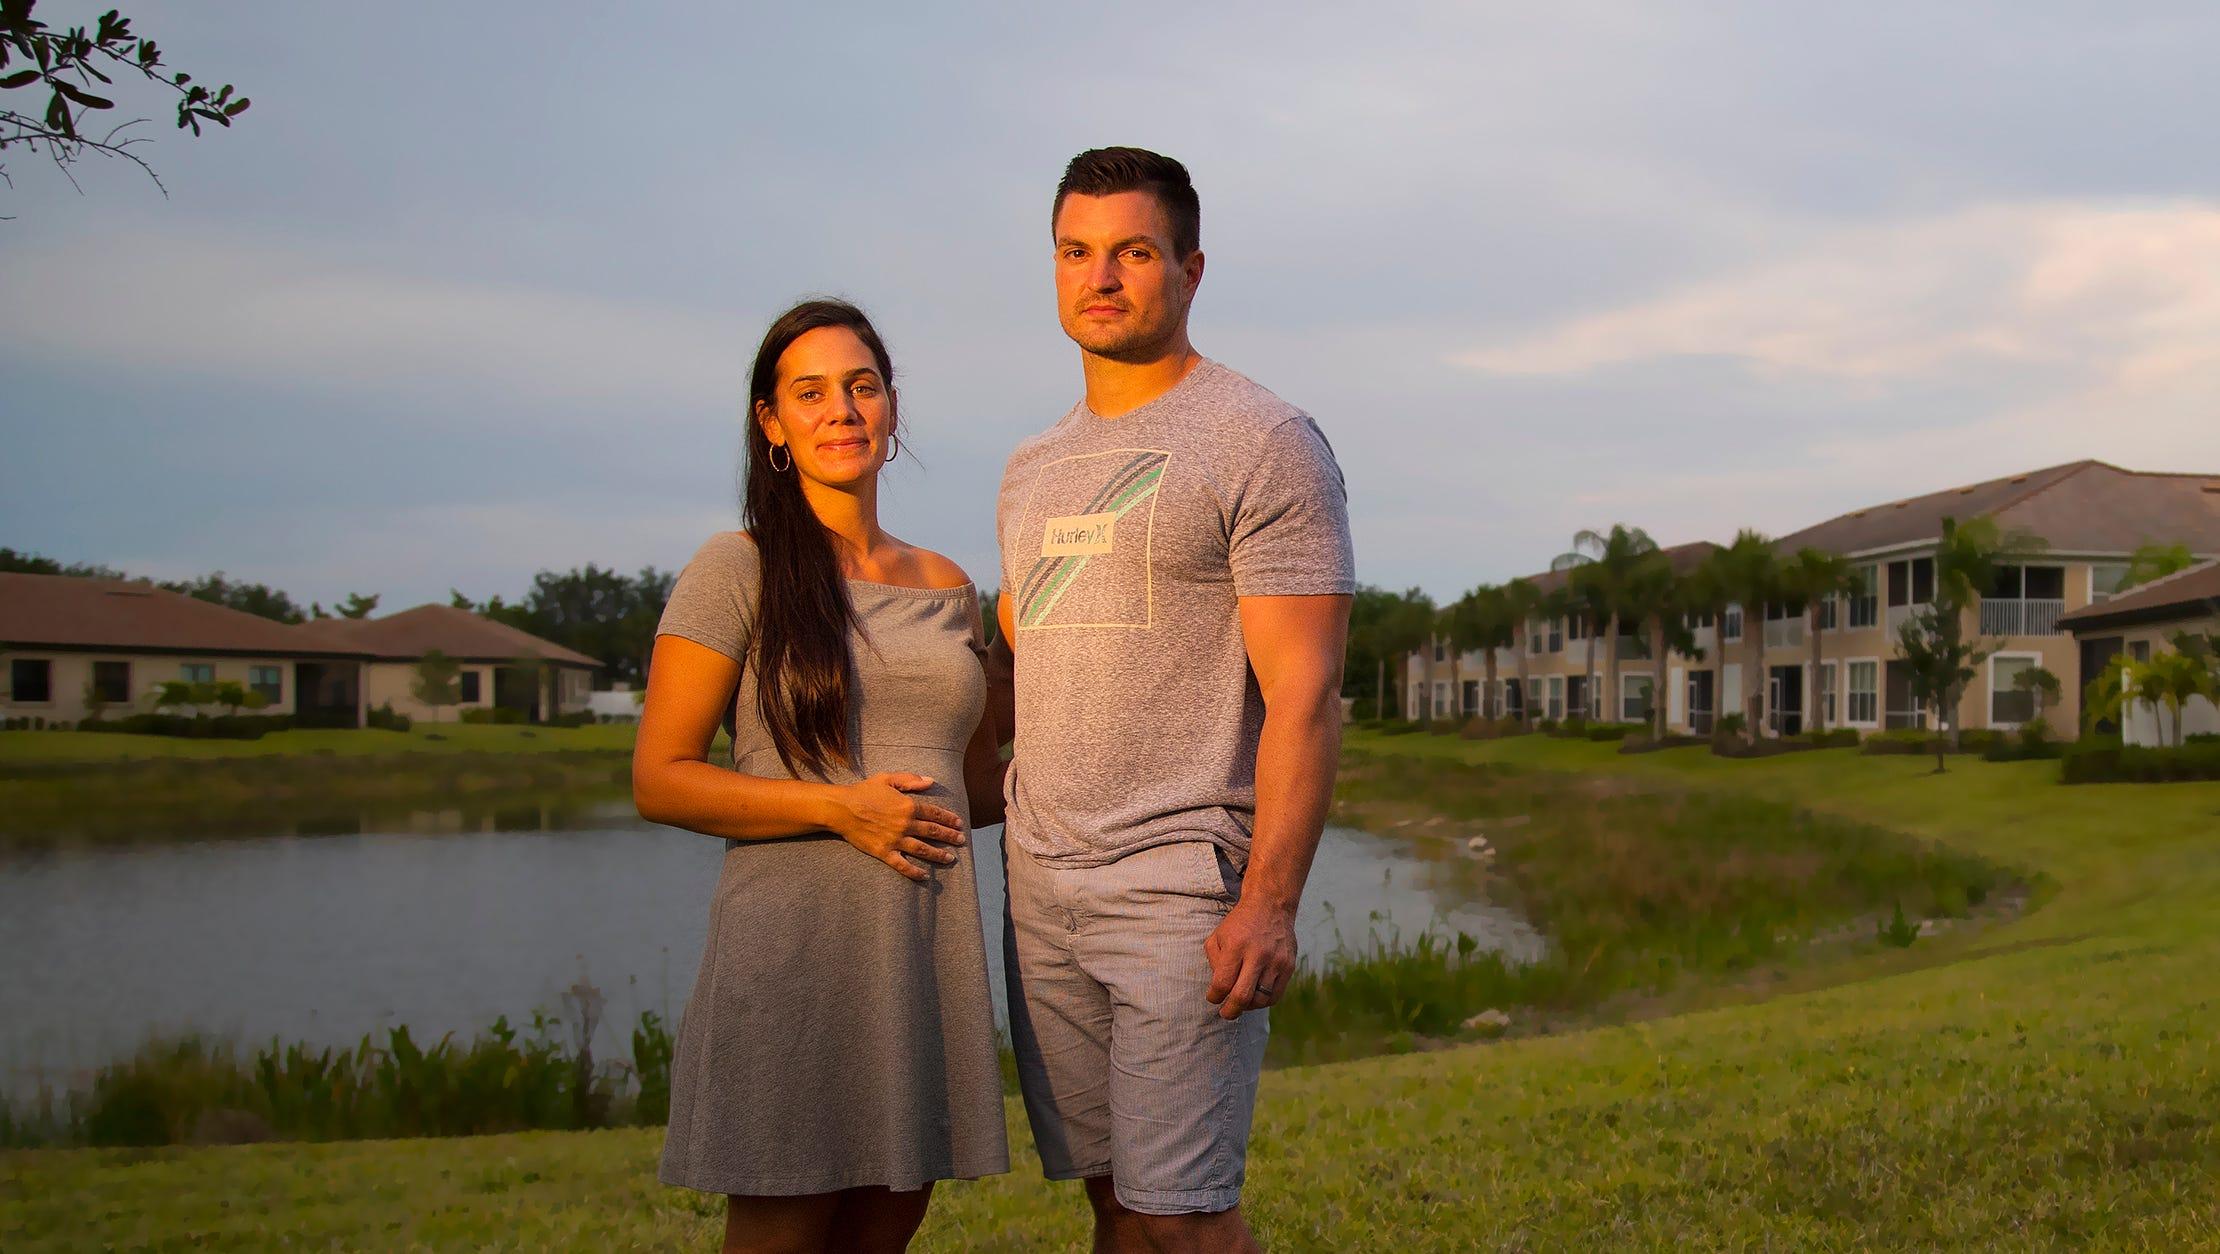 mother u0026 39 s day  couple celebrates new pregnancy after lightning strike